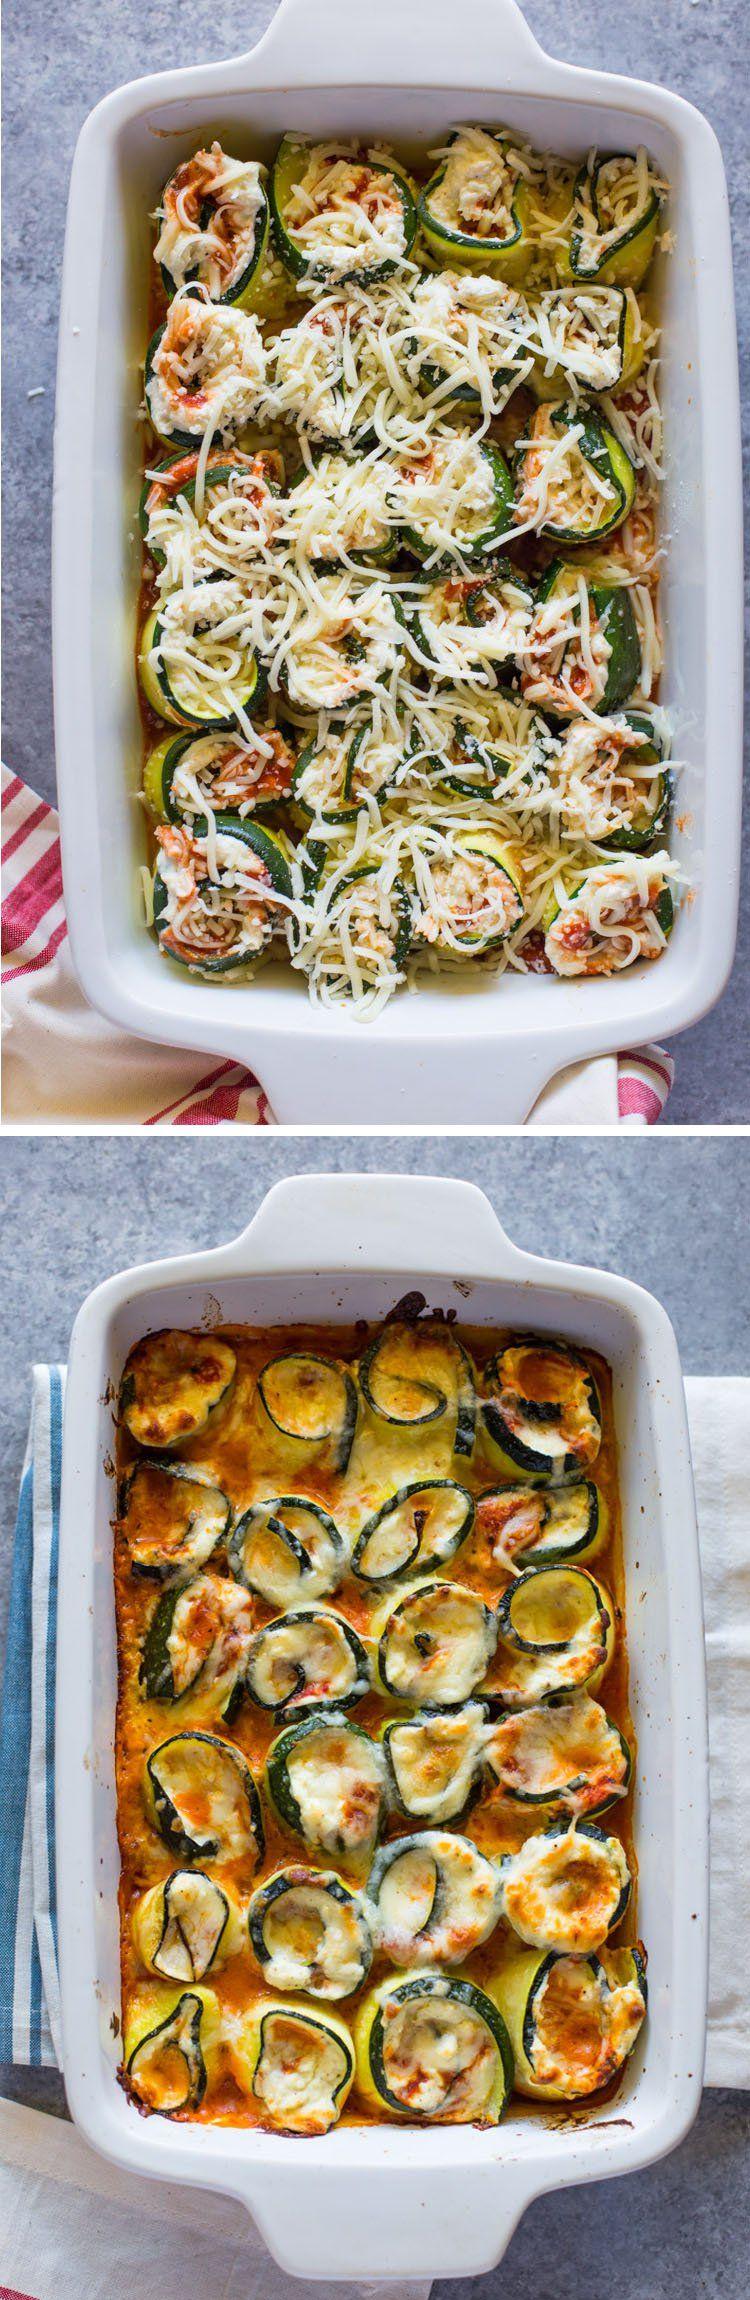 low carb zucchini lasagna roll ups recipe food. Black Bedroom Furniture Sets. Home Design Ideas